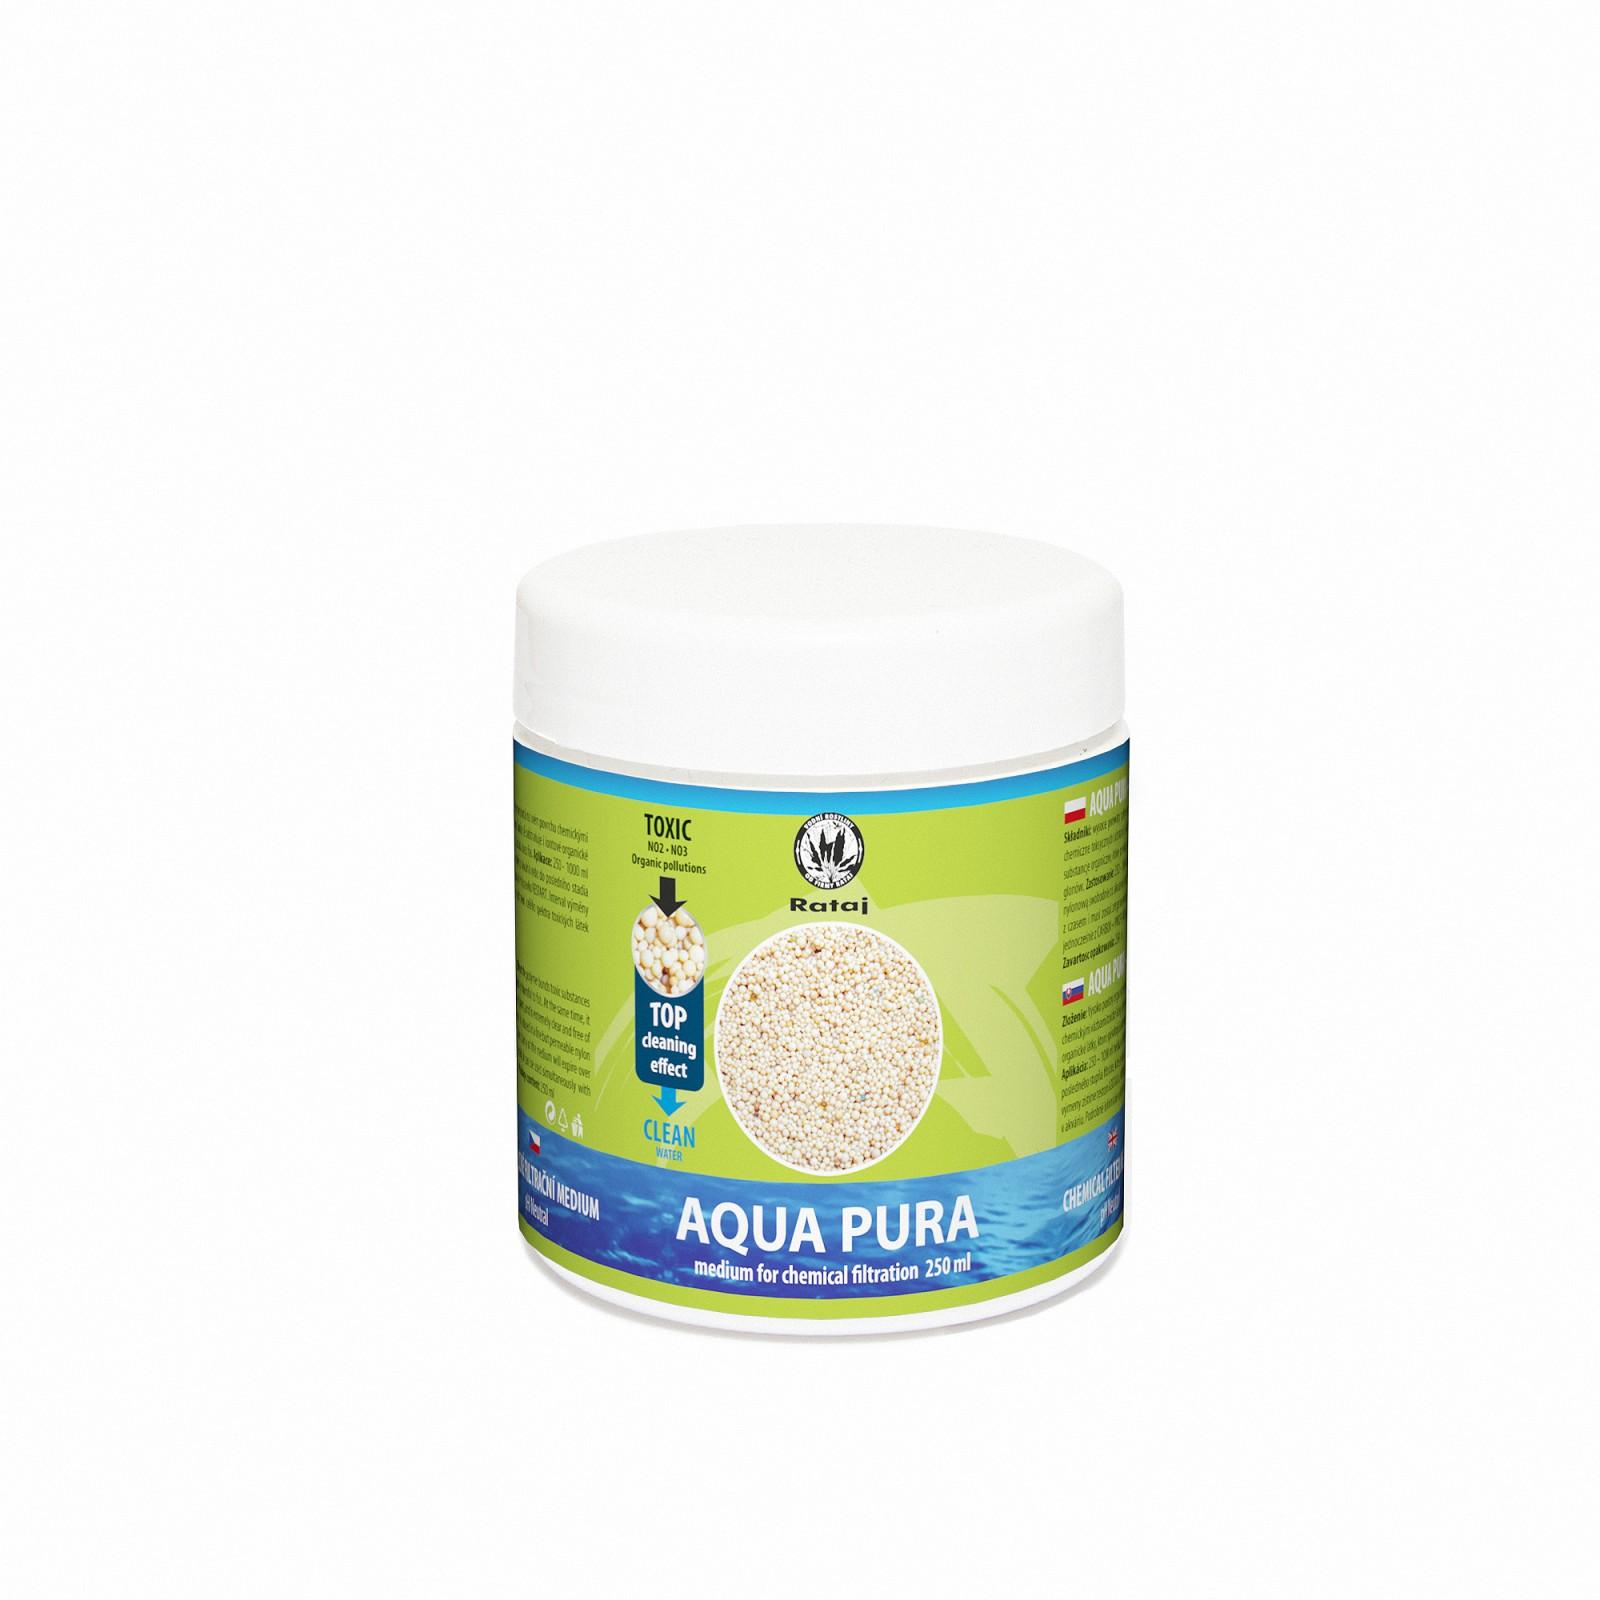 Aqua pura, Balení 500 ml